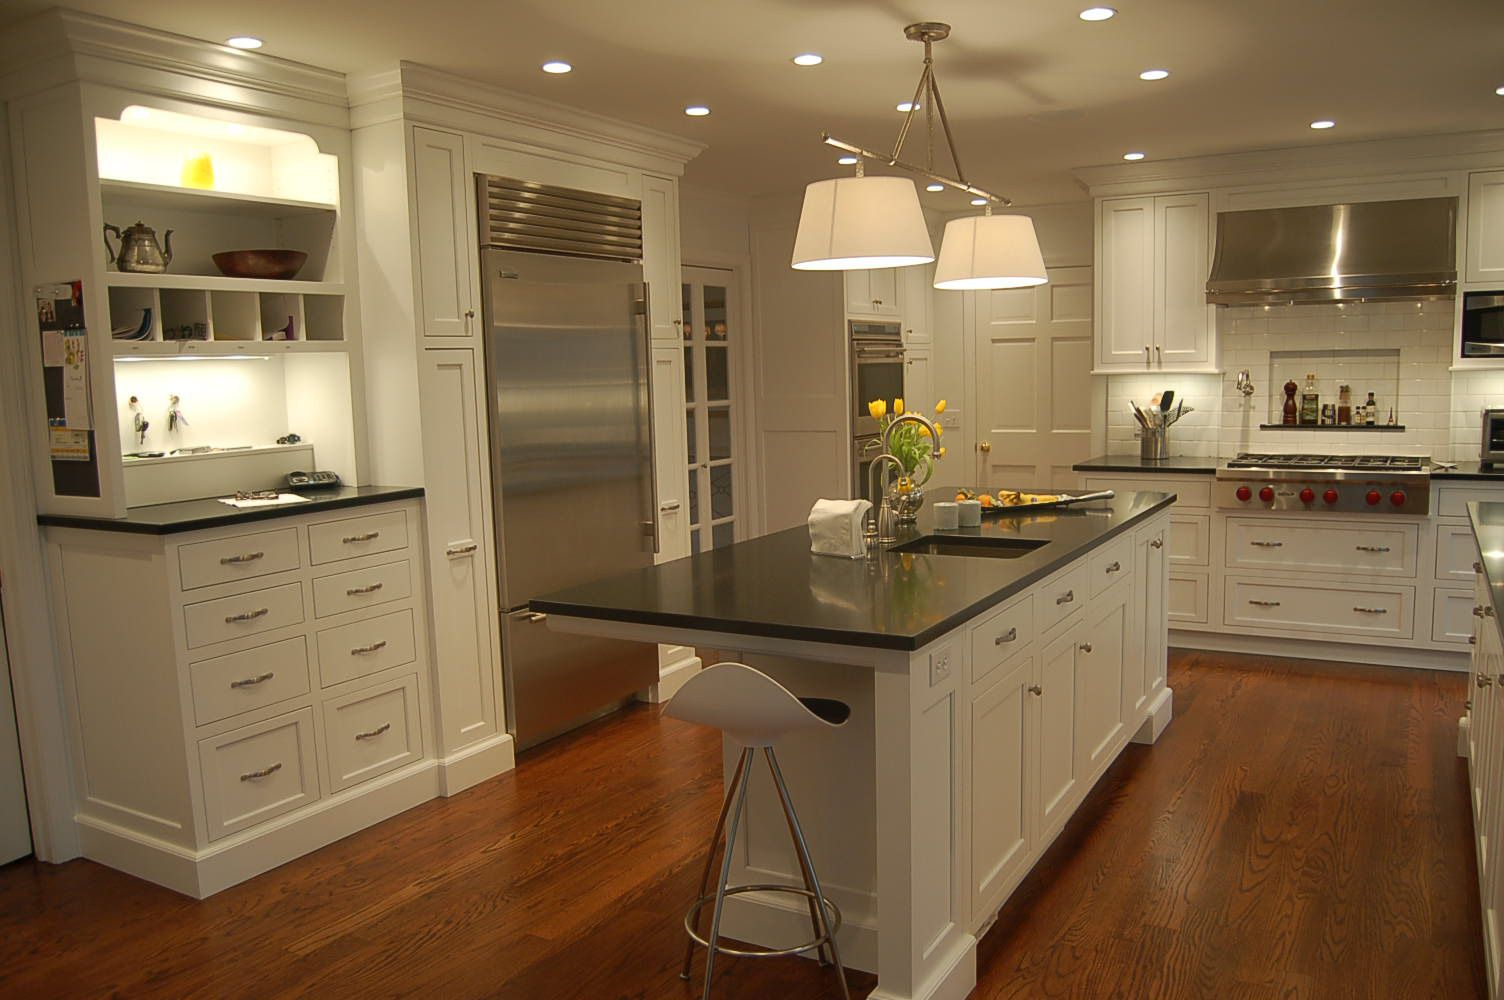 Plain White Kitchen Cabinets 17 Best Images About Kitchen Cabinet Color On Pinterest Islands